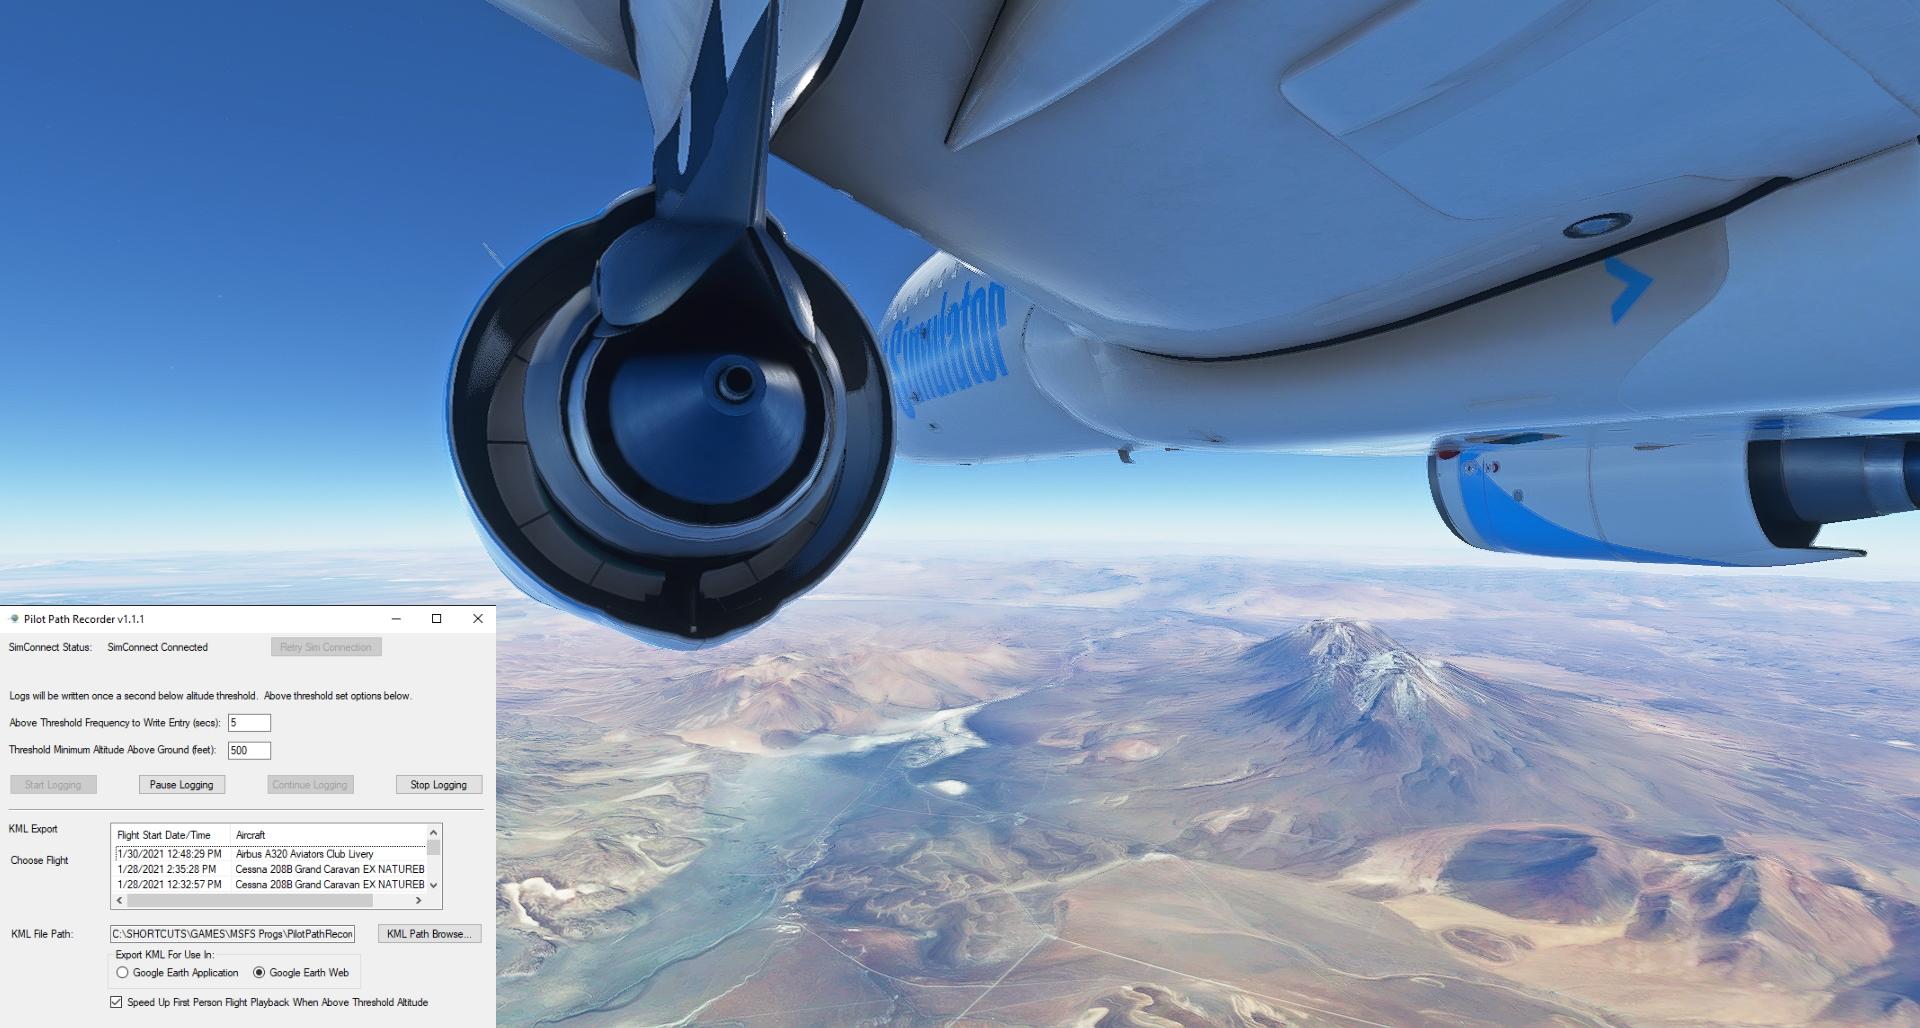 Microsoft Flight Simulator add-ons Pilot Path Recorder V2